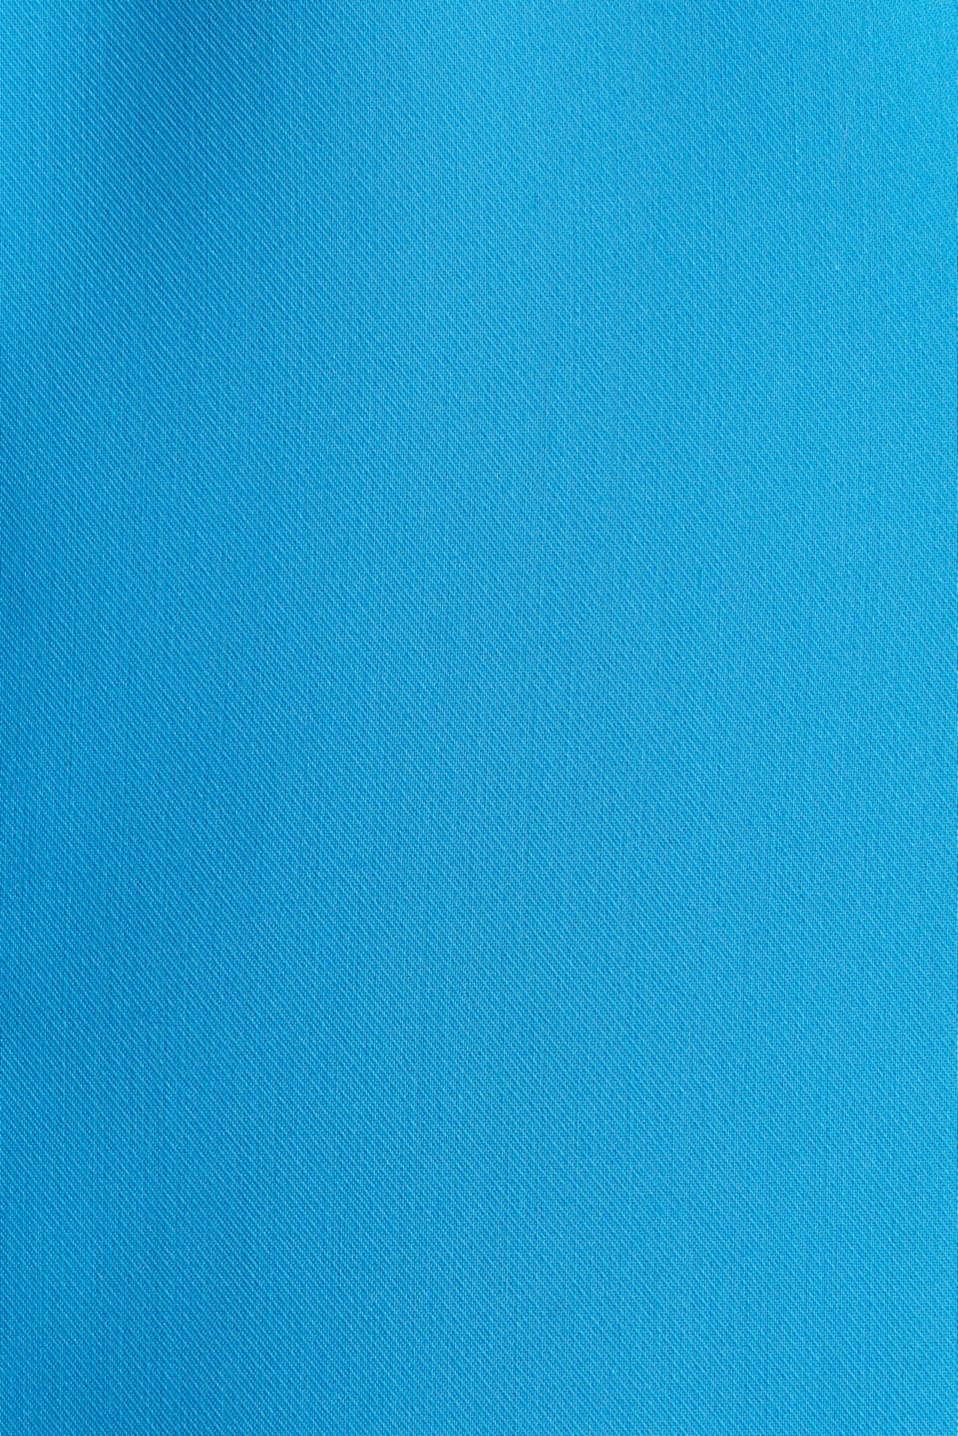 SHIMMER mix + match stretch blazer, DARK TURQUOISE, detail image number 4